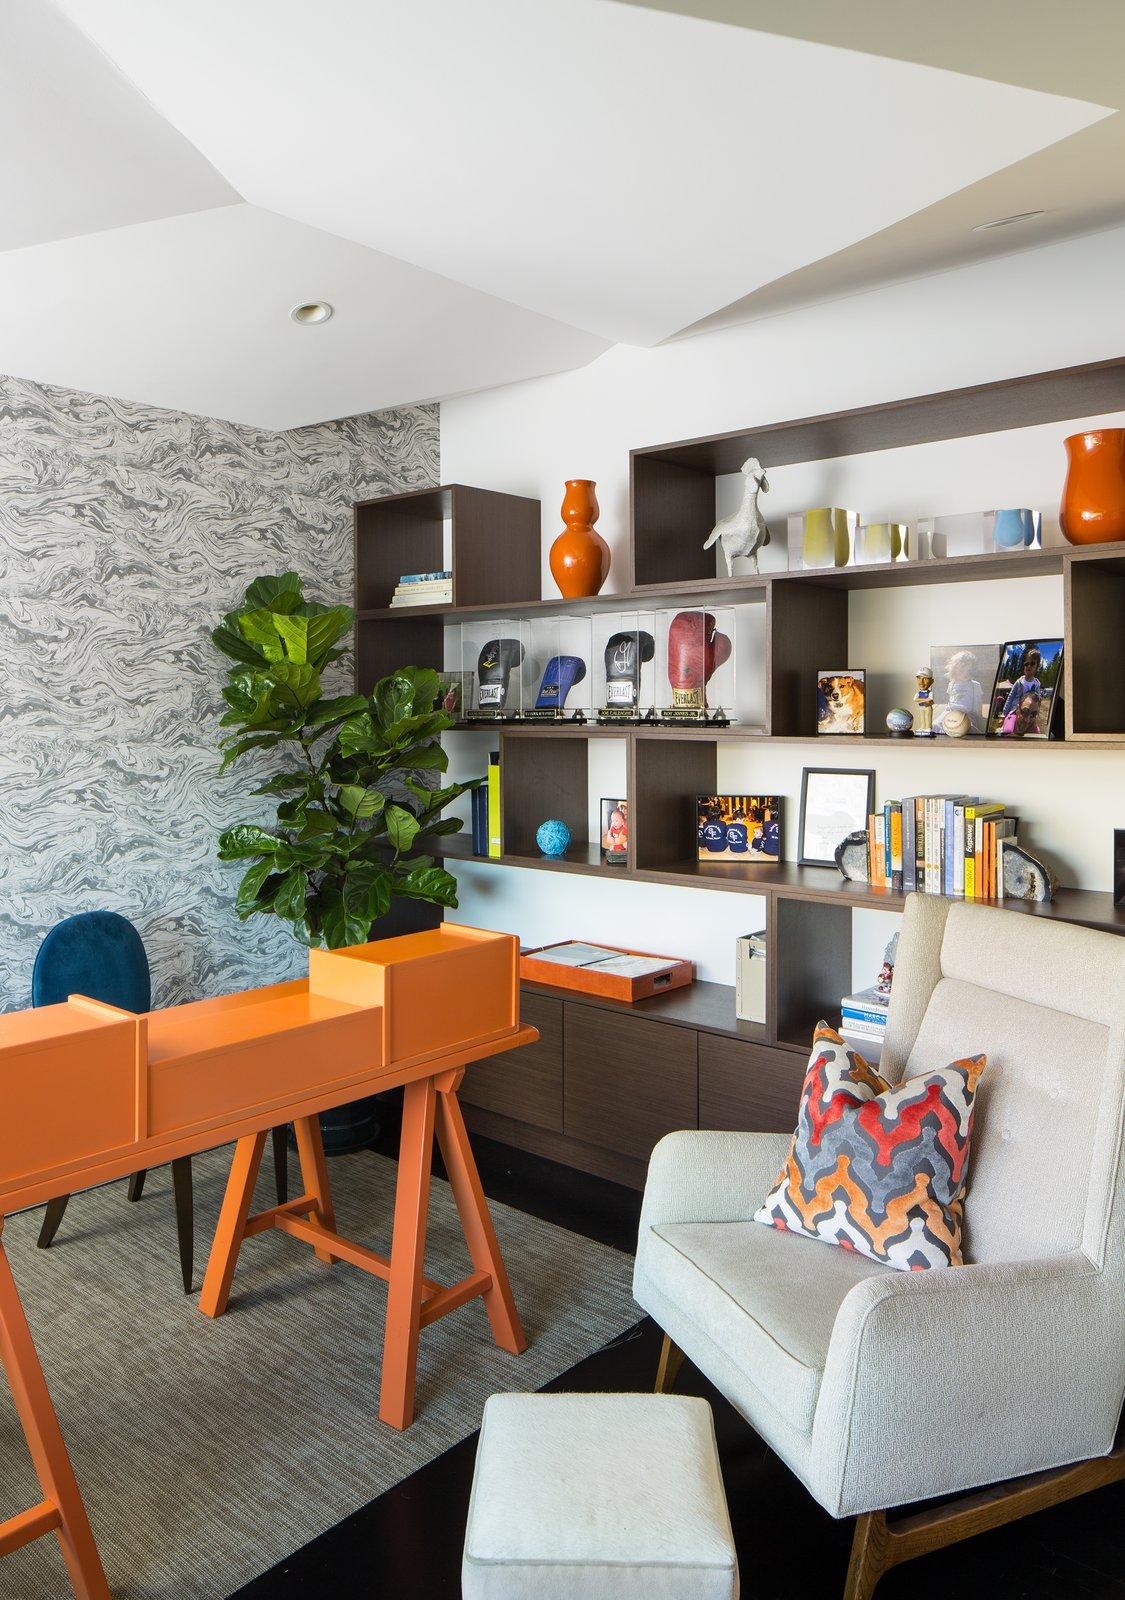 Office, Study Room Type, Bookcase, Desk, Chair, Shelves, and Dark Hardwood Floor Office  Donner Residence by Design Platform